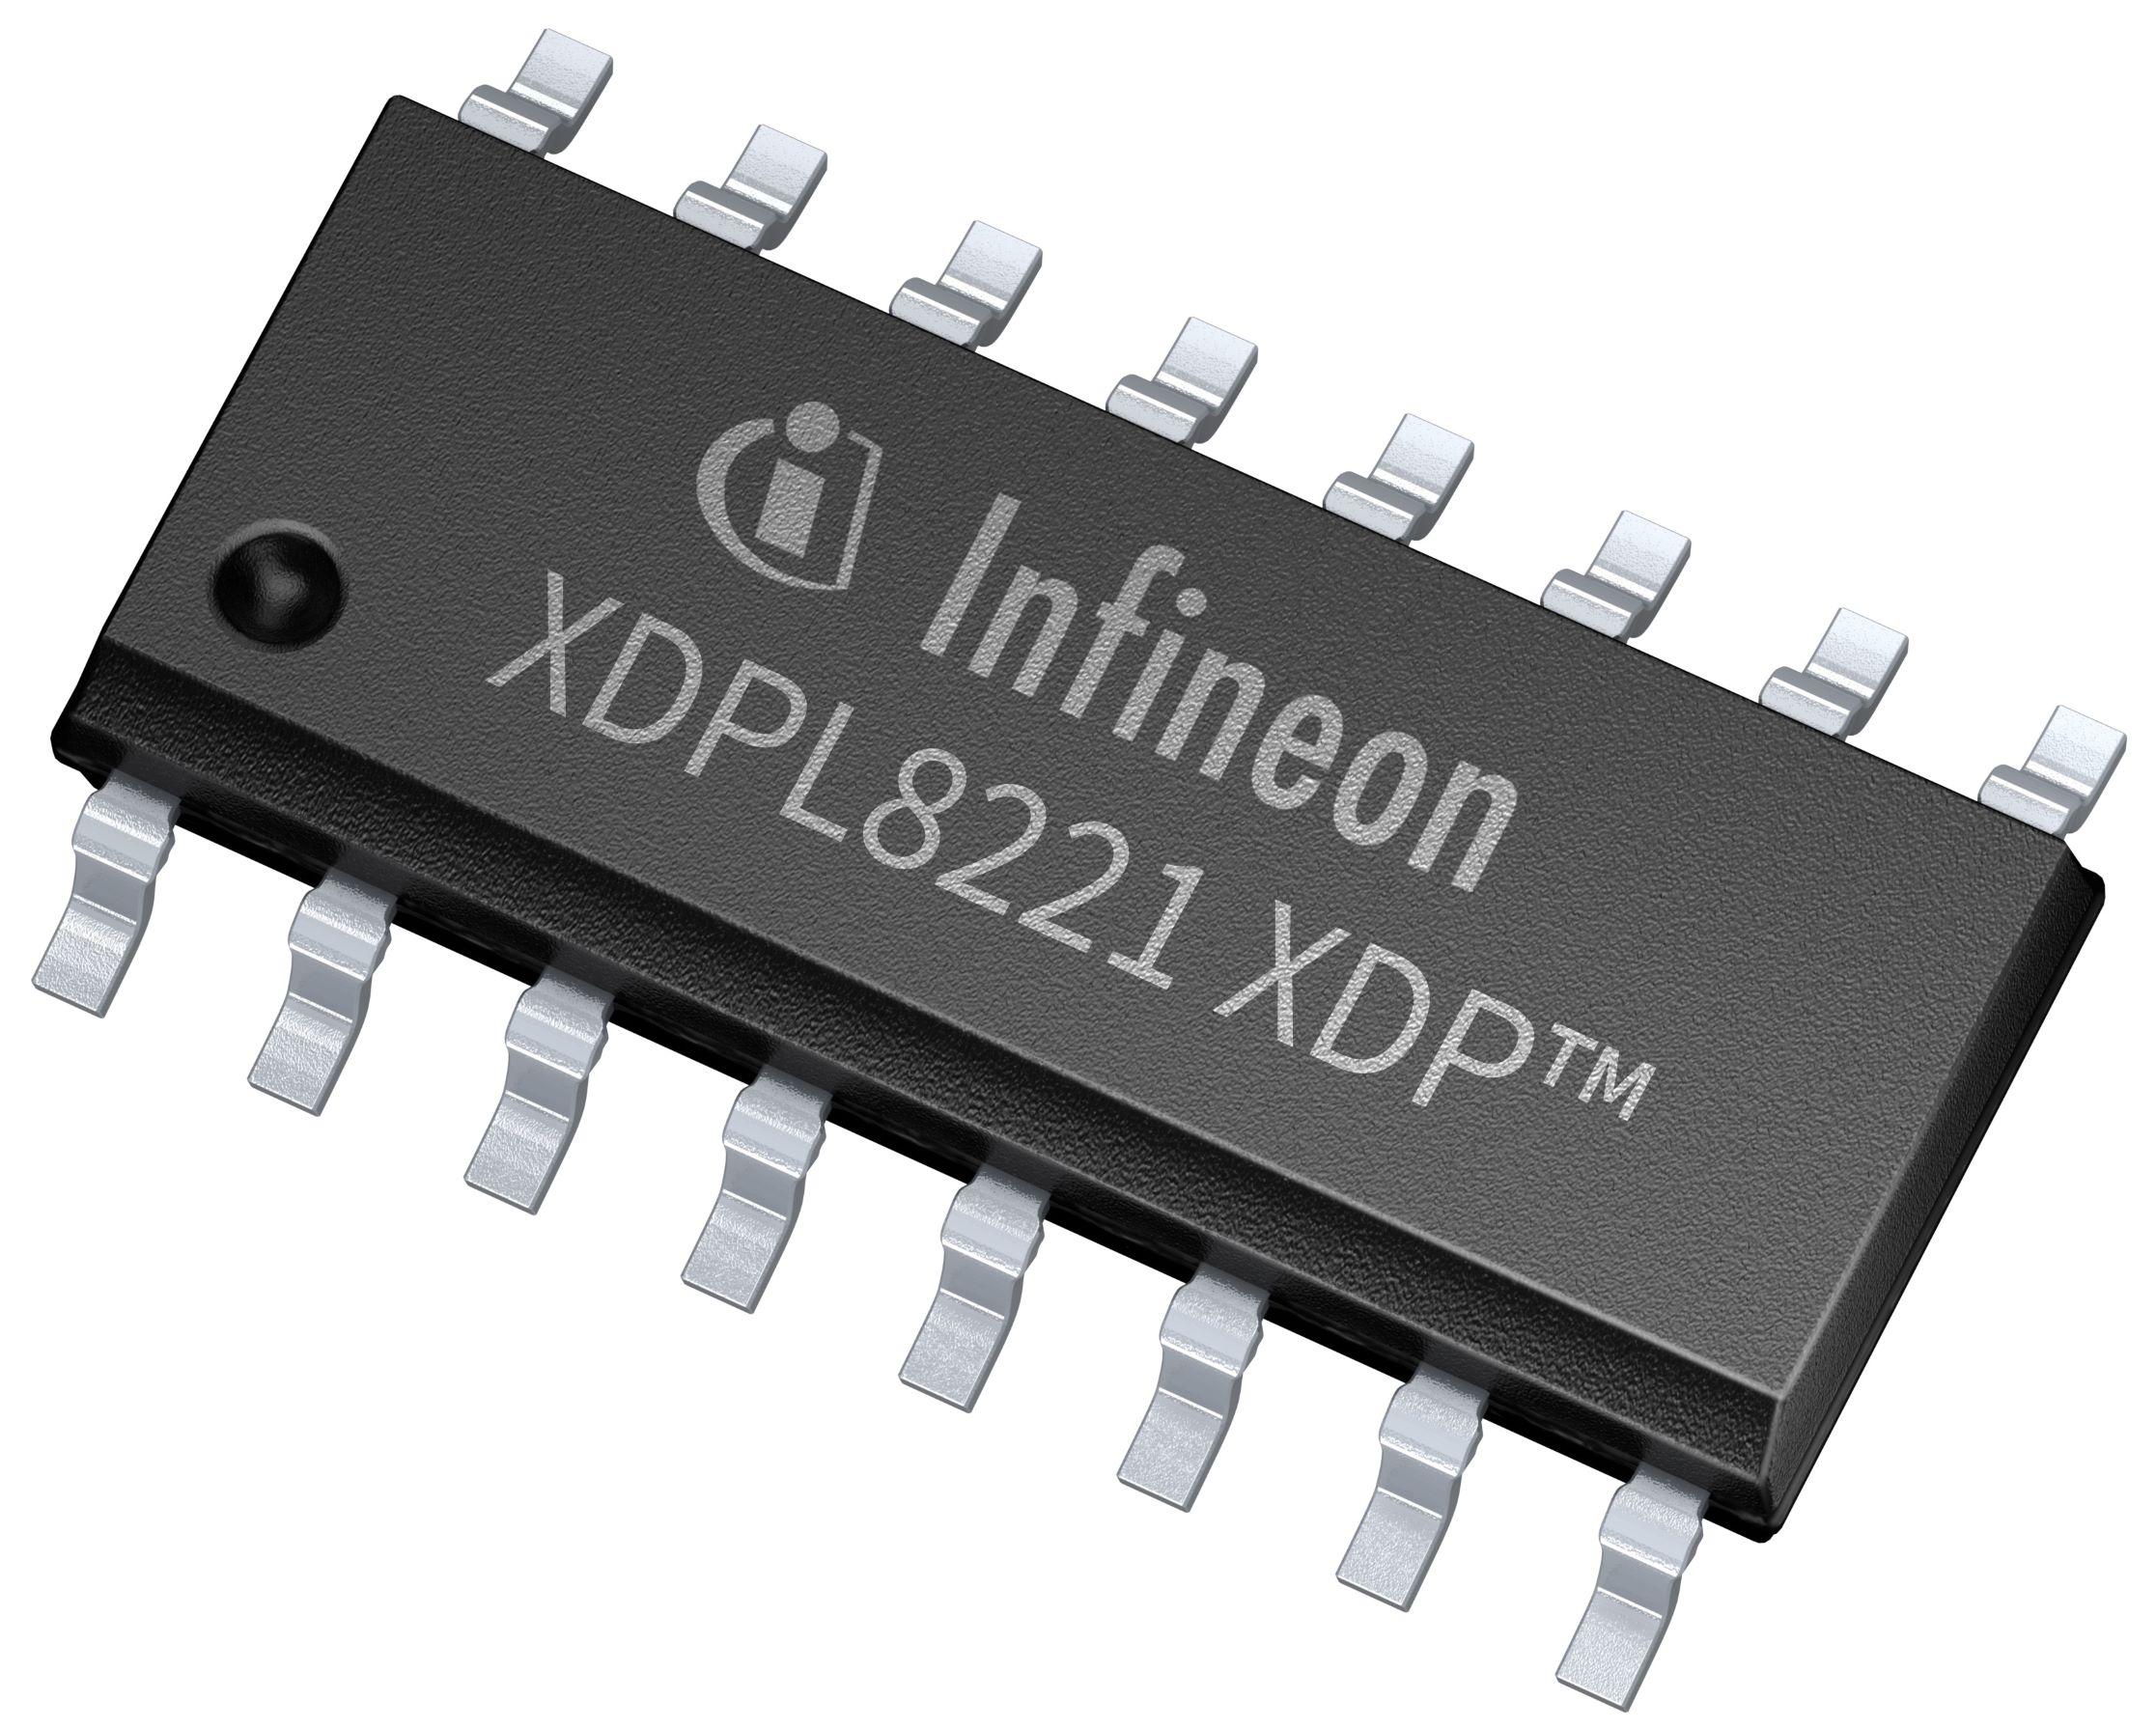 XDPL8221:带通讯功能的LED驱动芯片,葡京网址照明的理想选择